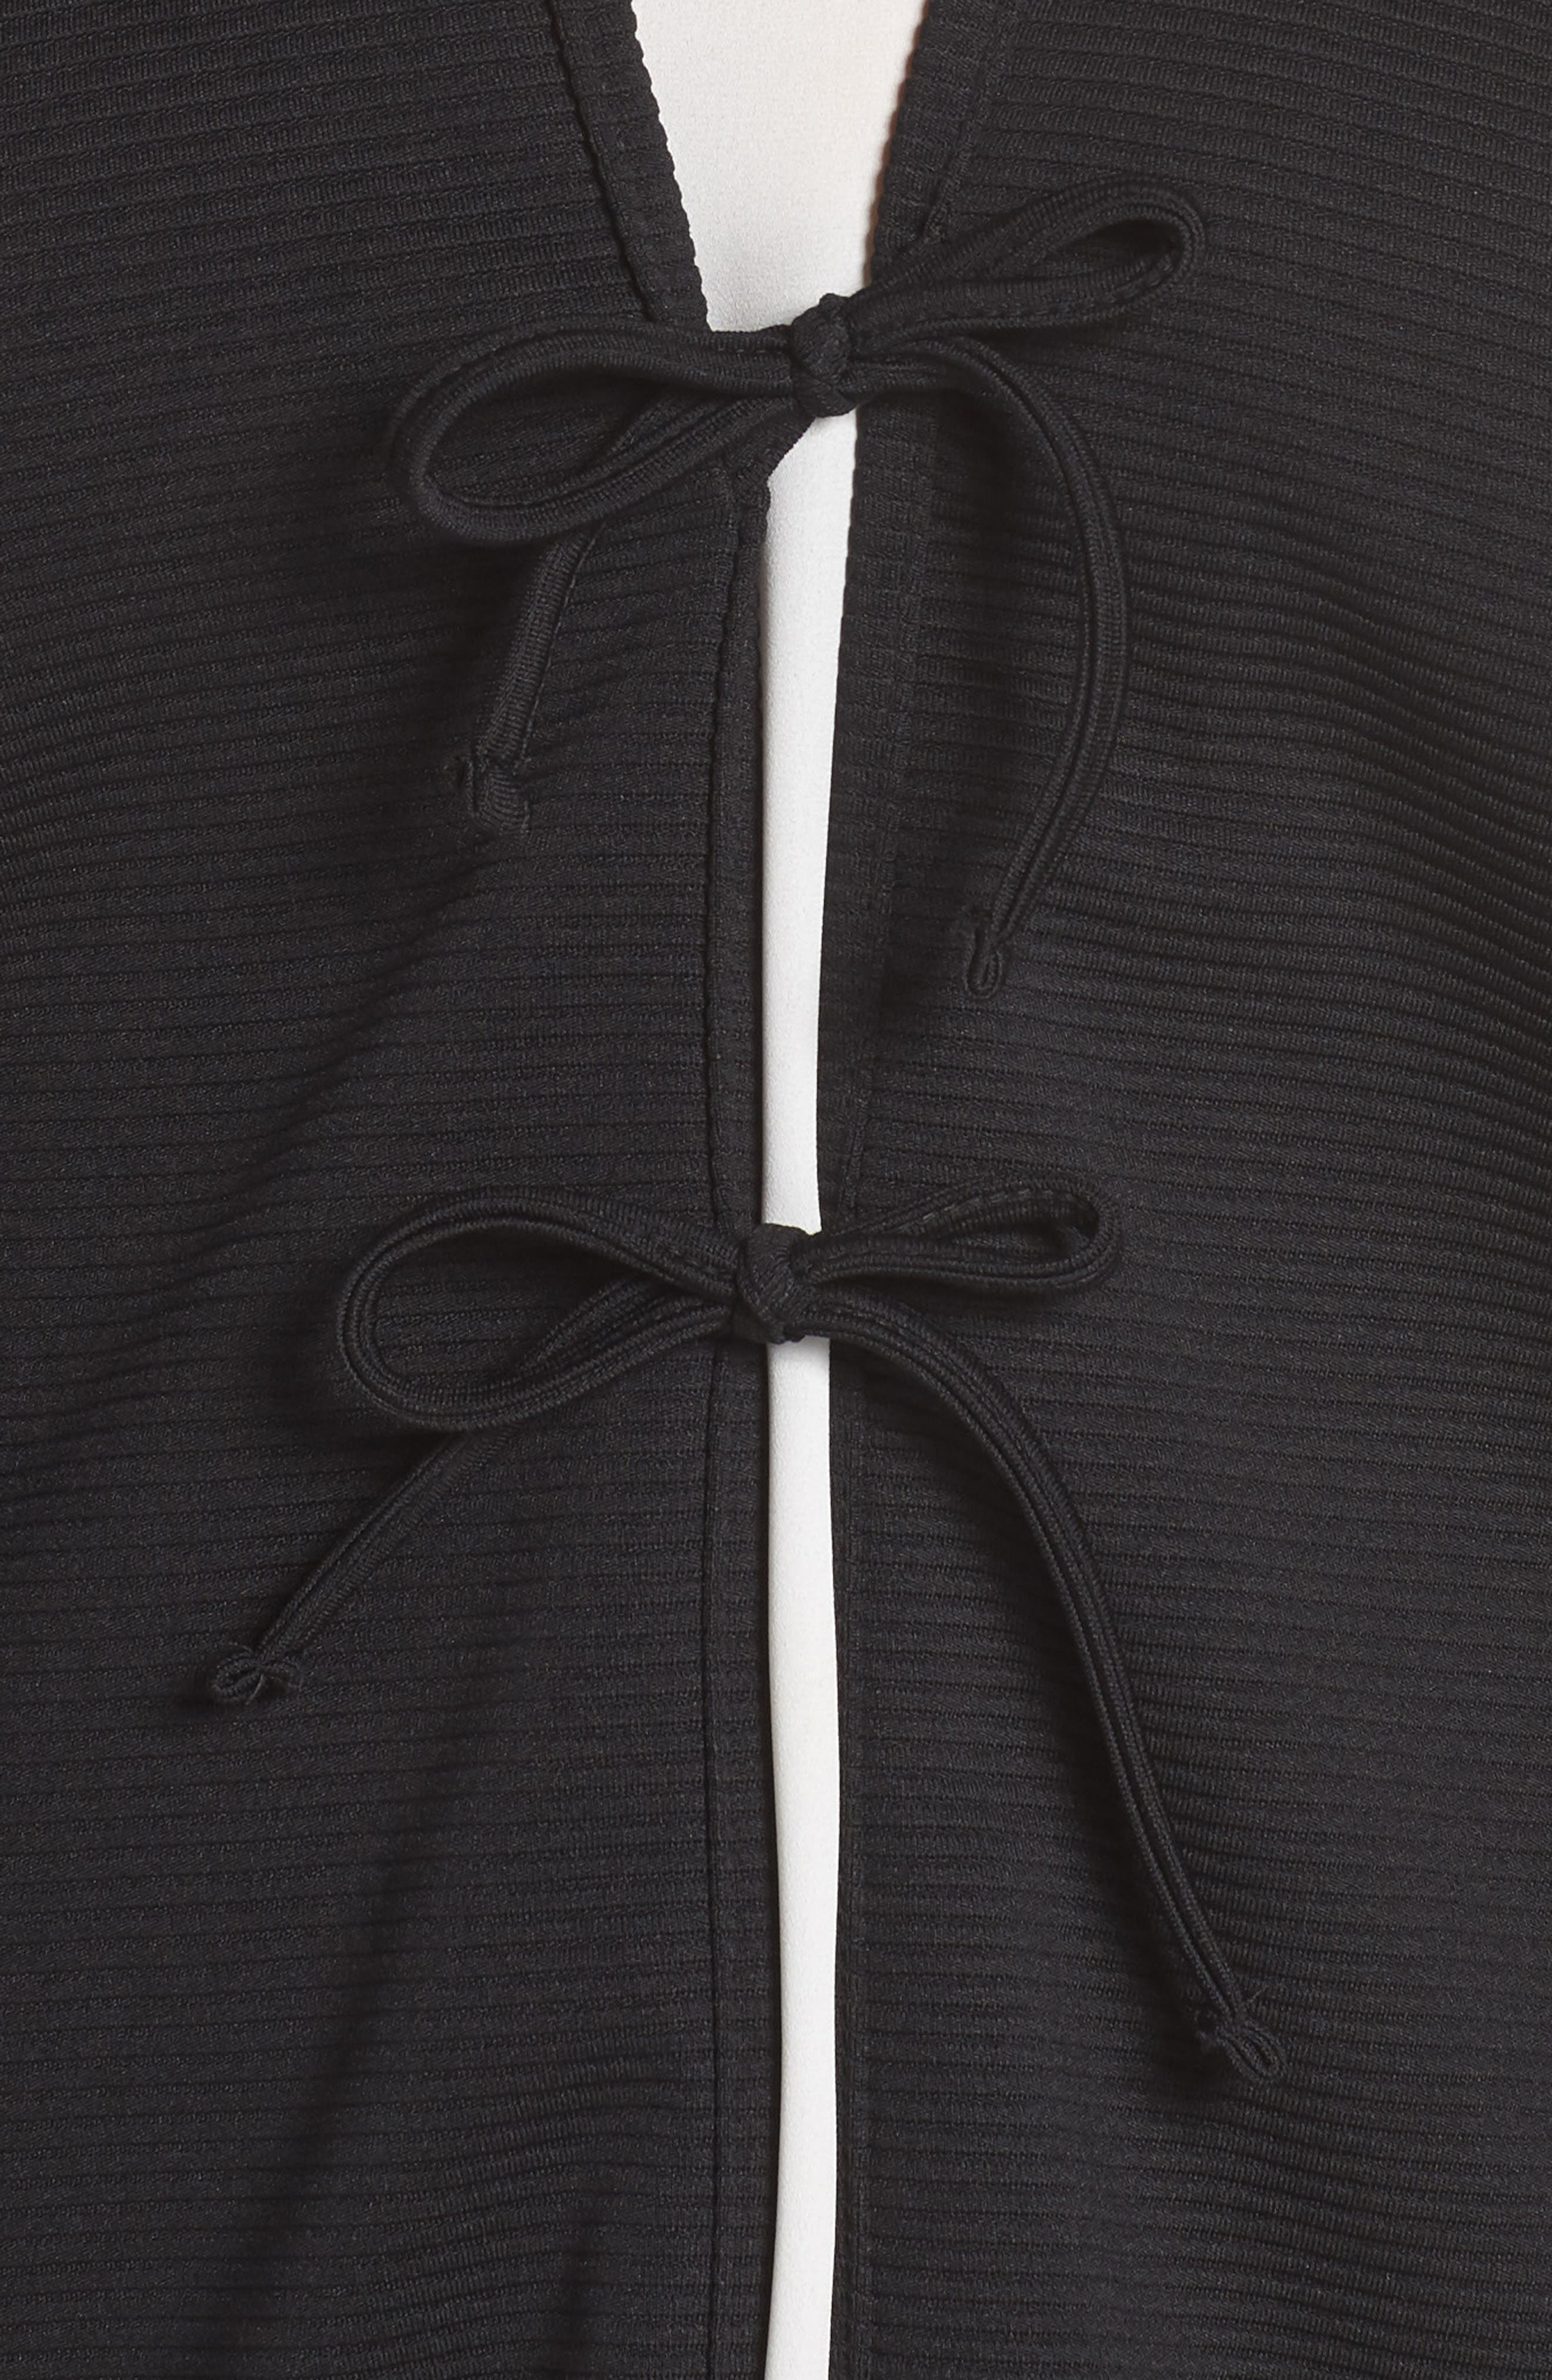 The Lacquer Bonded Jersey Kimono,                             Alternate thumbnail 4, color,                             001